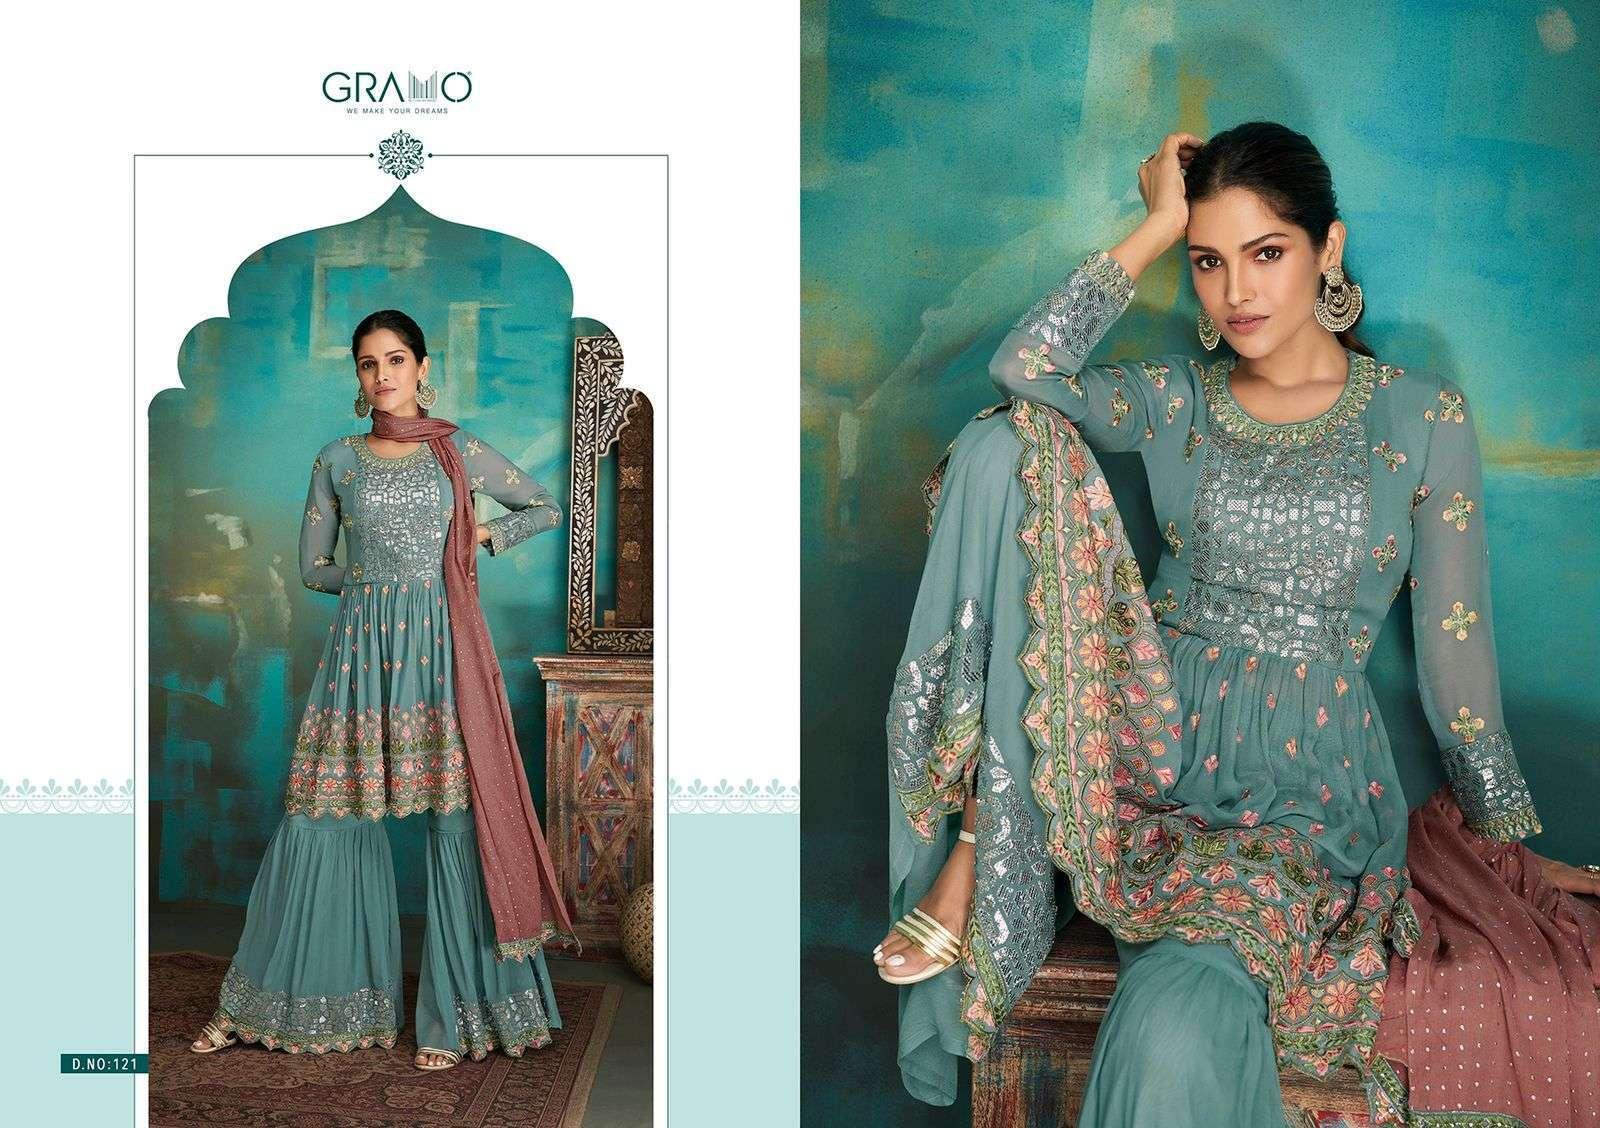 Gramo Navabi Vol 1 Georgette With Heavy Embroidery Work Salwar Kameez Collection 01